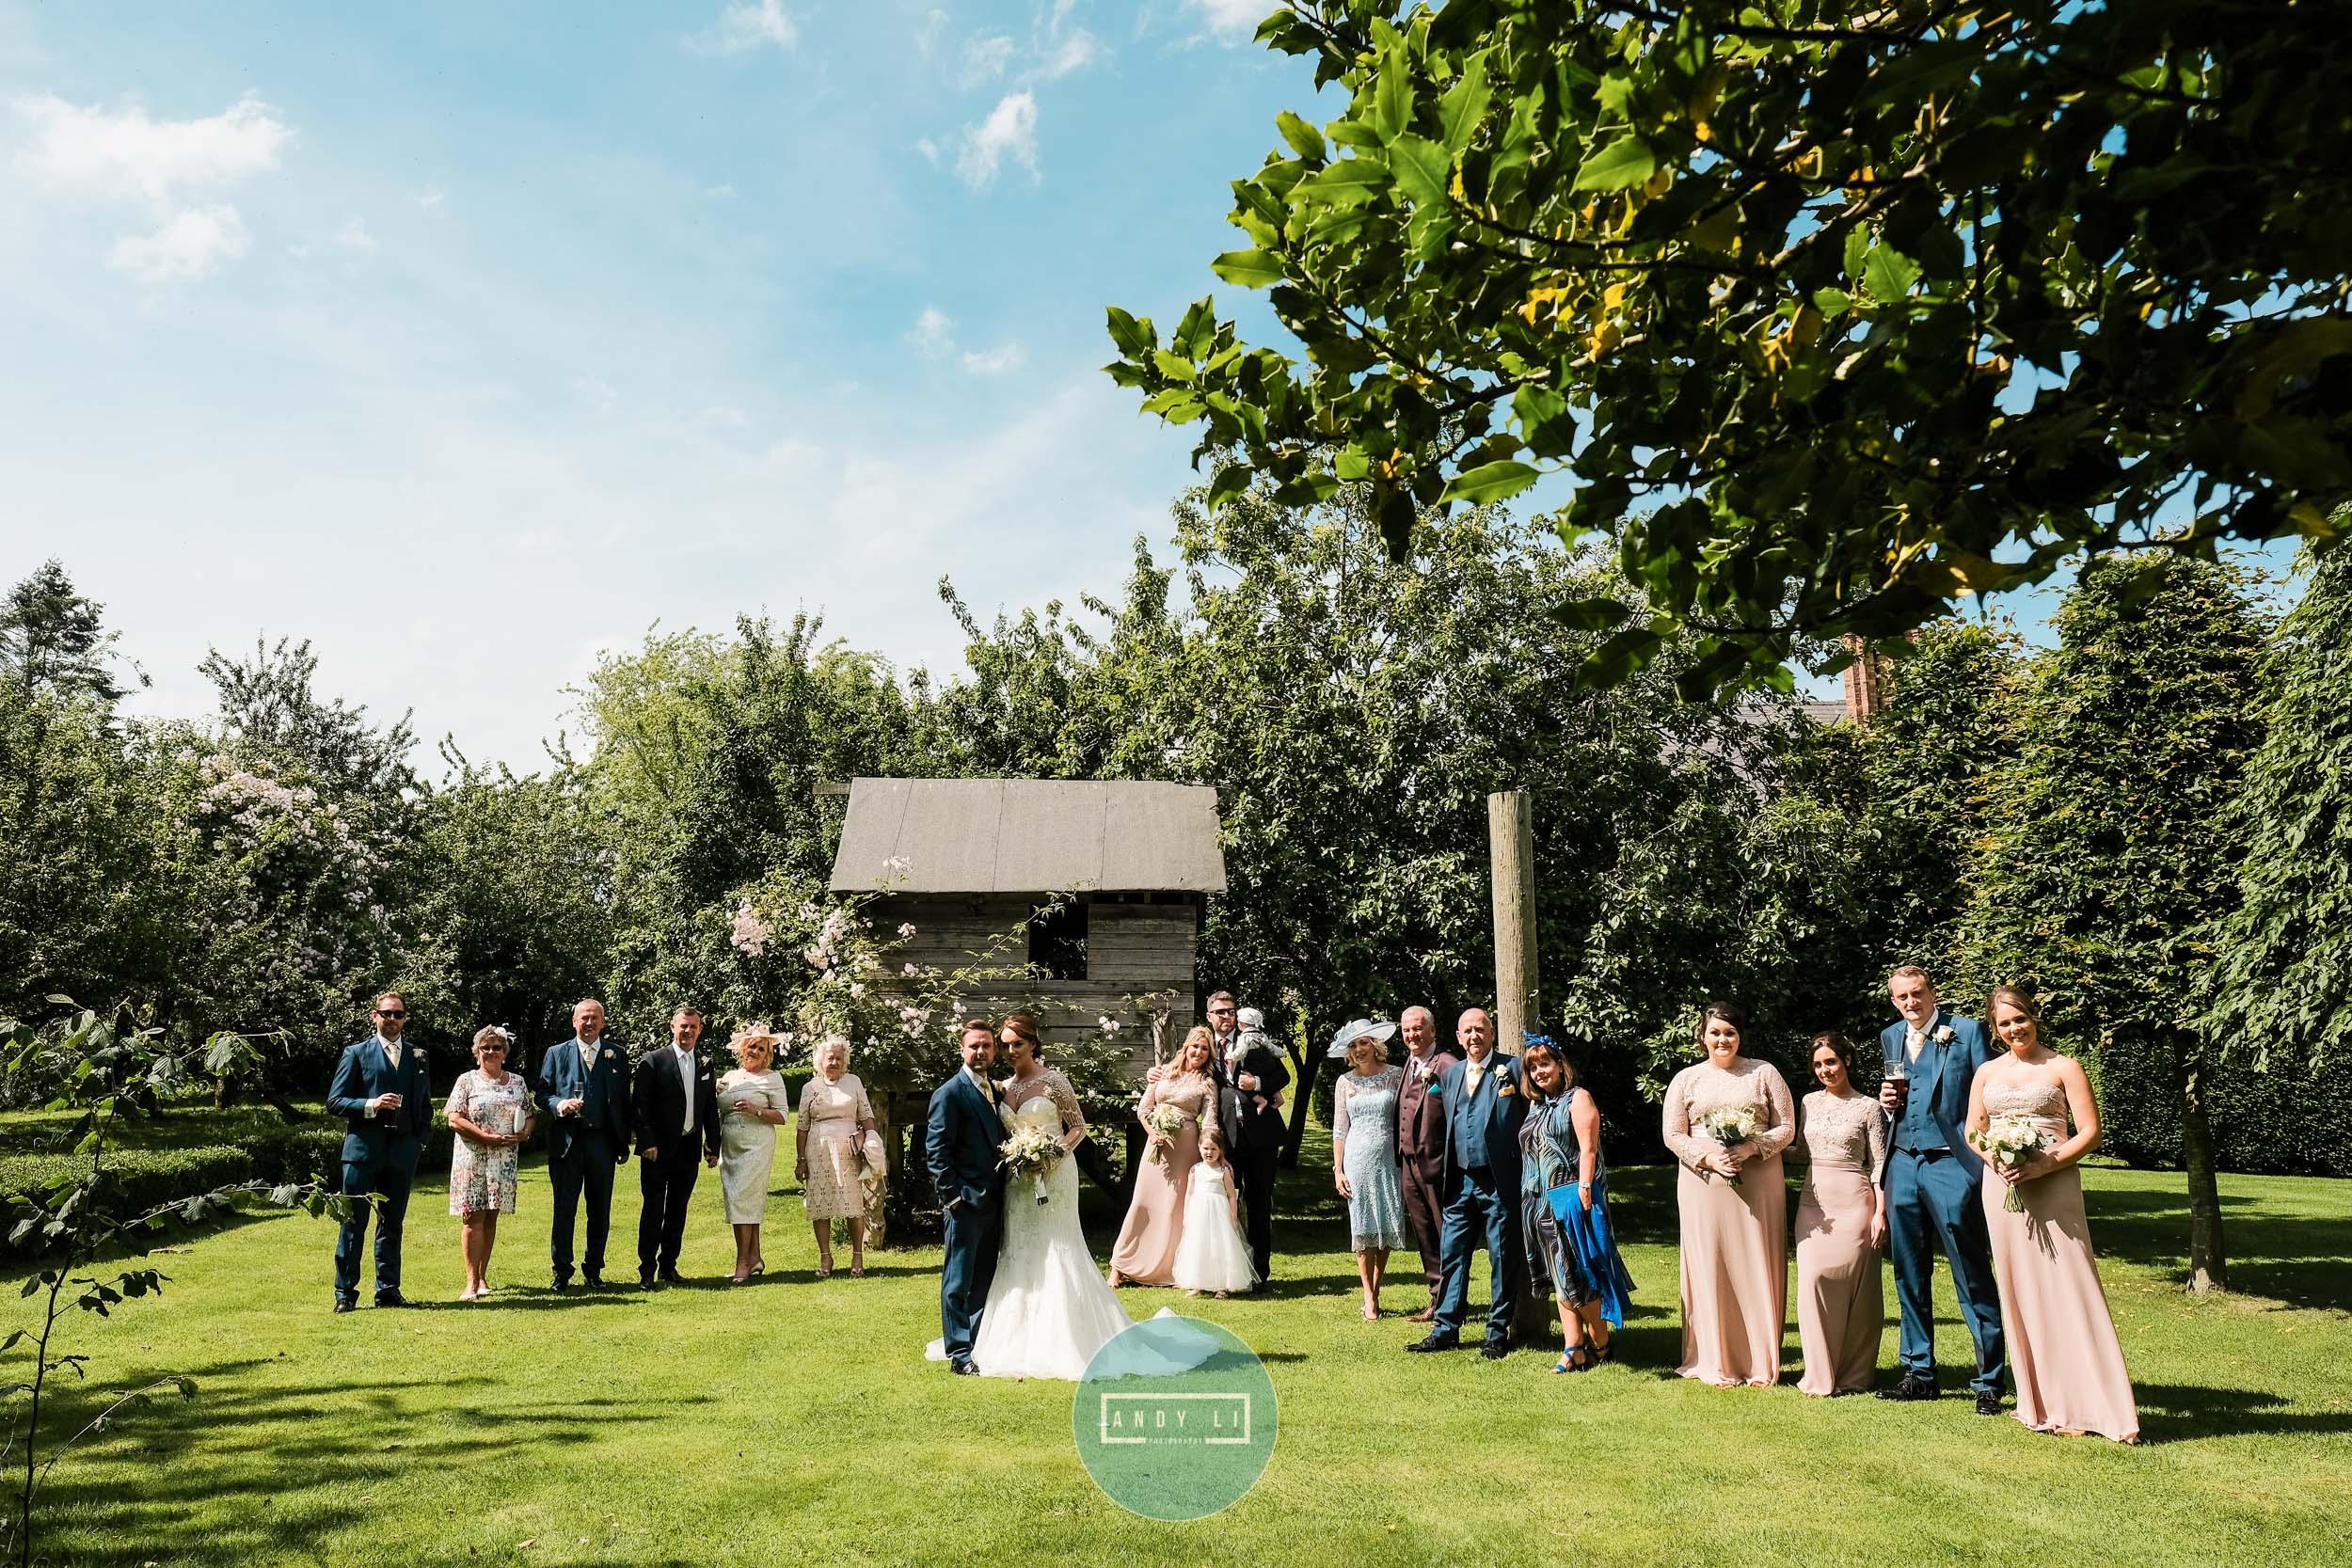 Pimhill Barn Wedding Photographer-081-XPRO6302.jpg